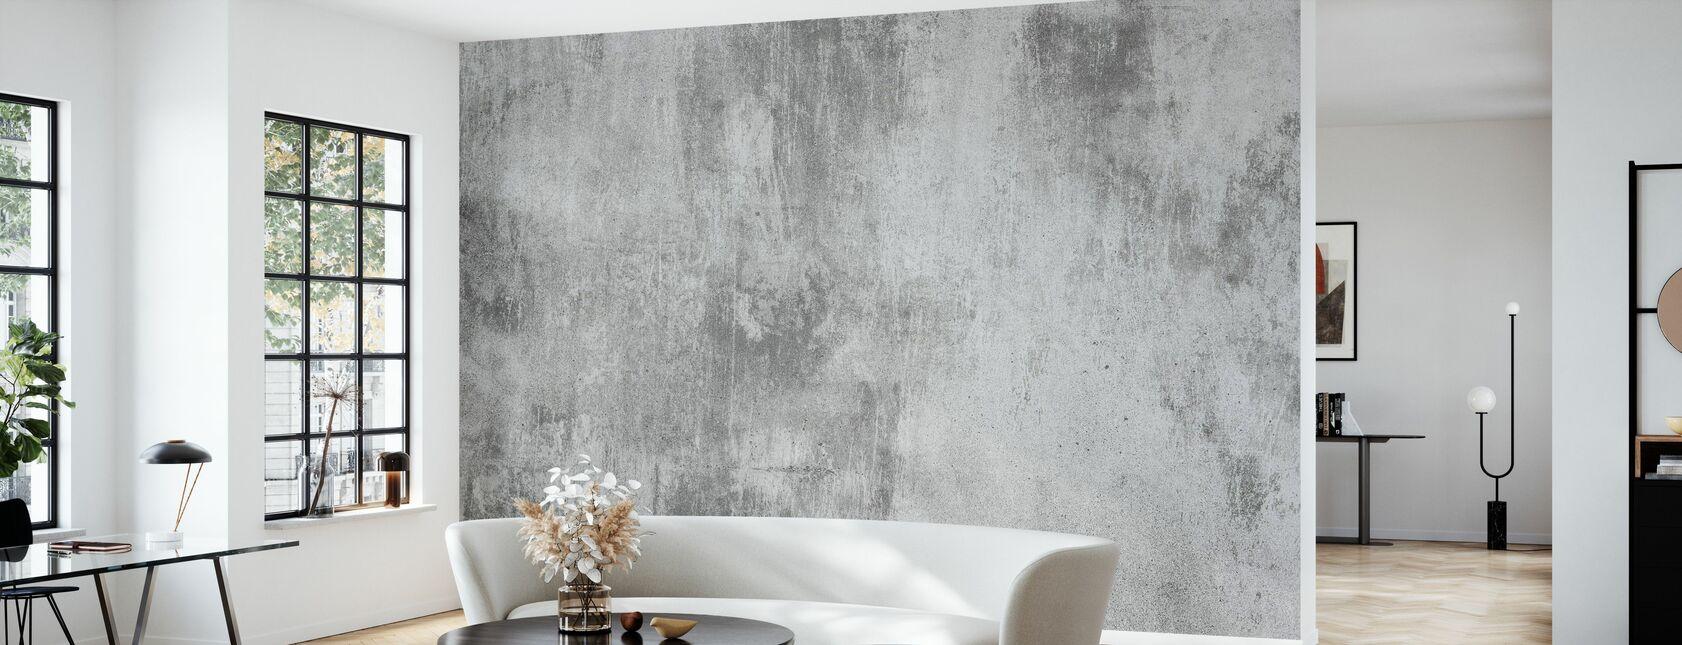 Beton væg - Tapet - Stue